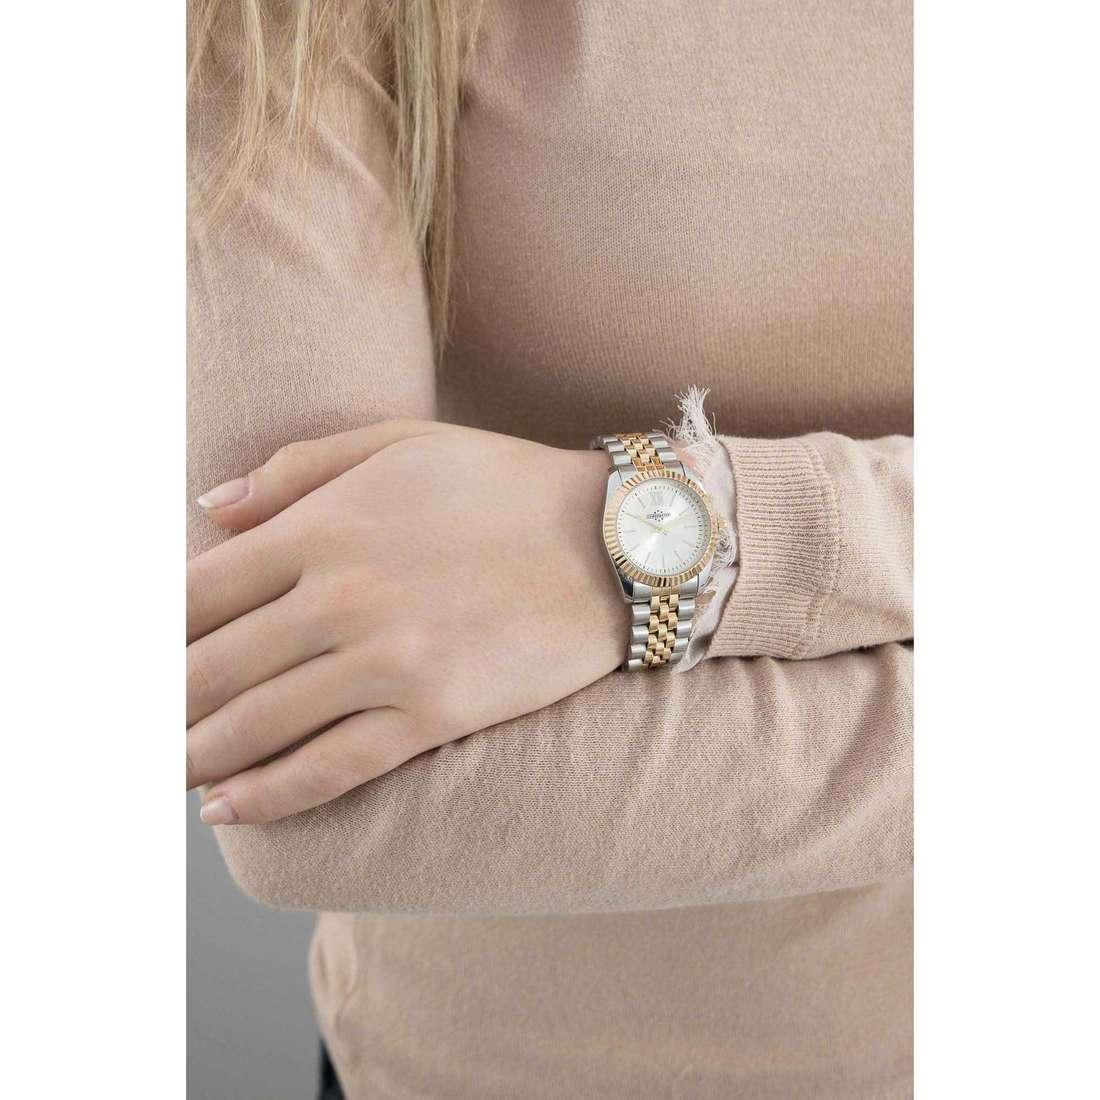 Chronostar seul le temps Luxury femme R3753241505 indosso